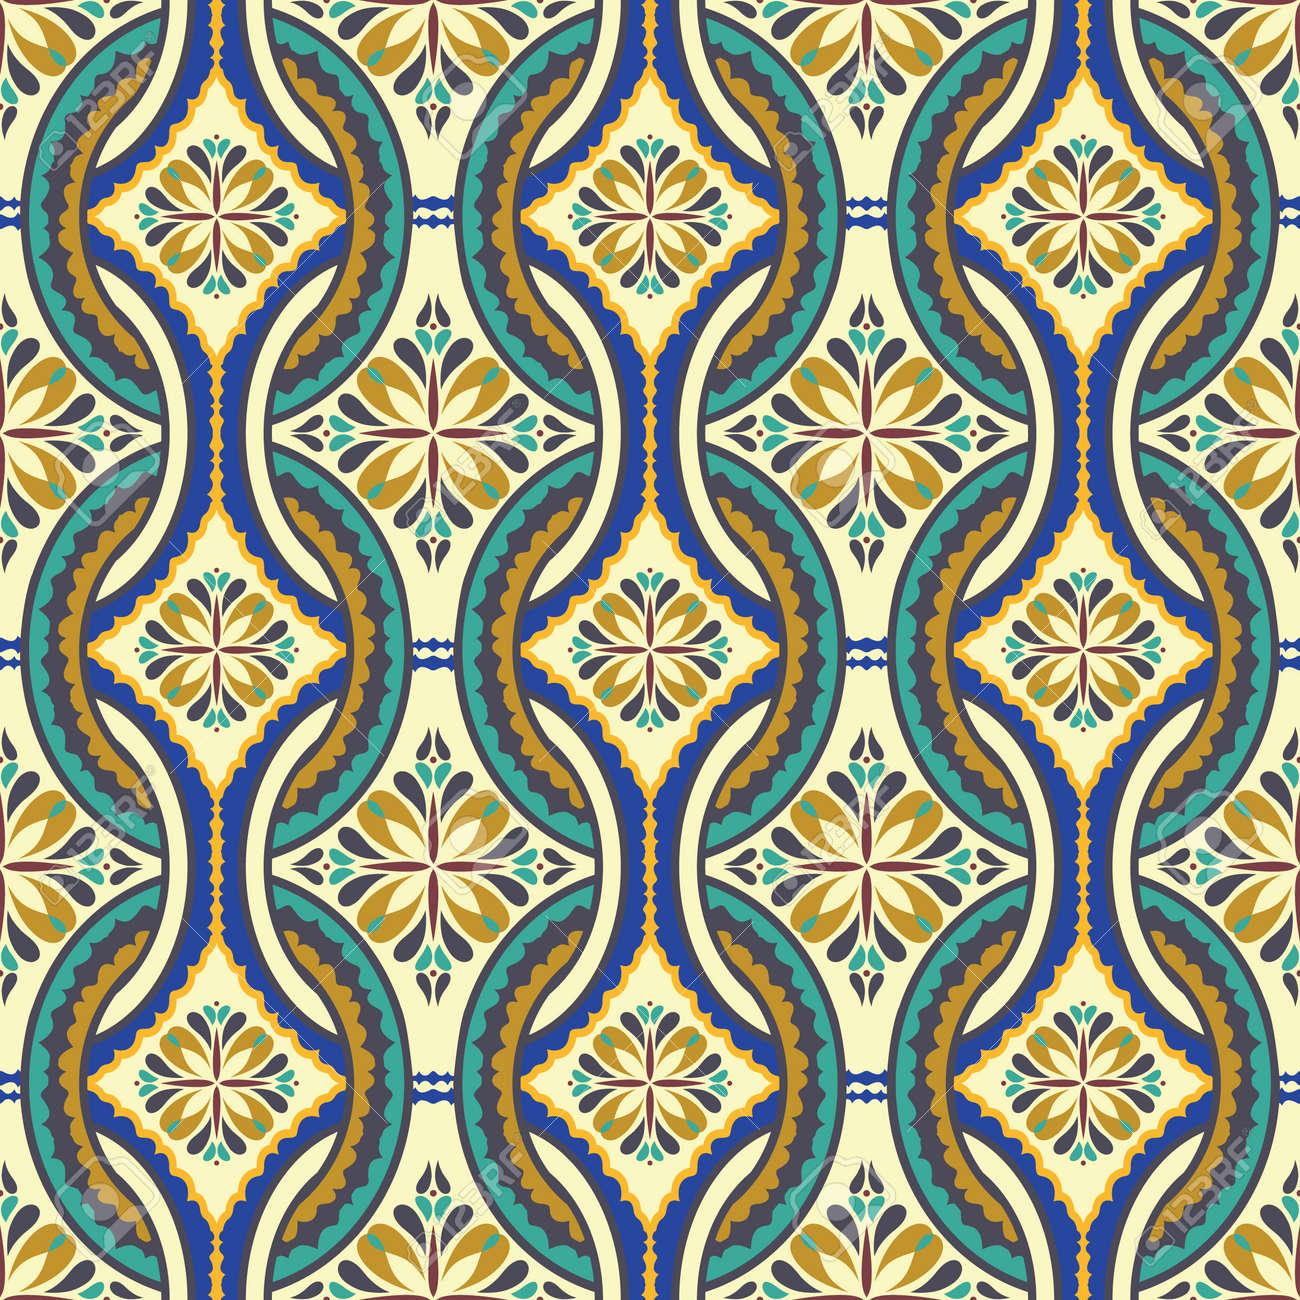 Seamless De Carrelage Marocain Style Rétro Vert-bleu-orange-beige ...